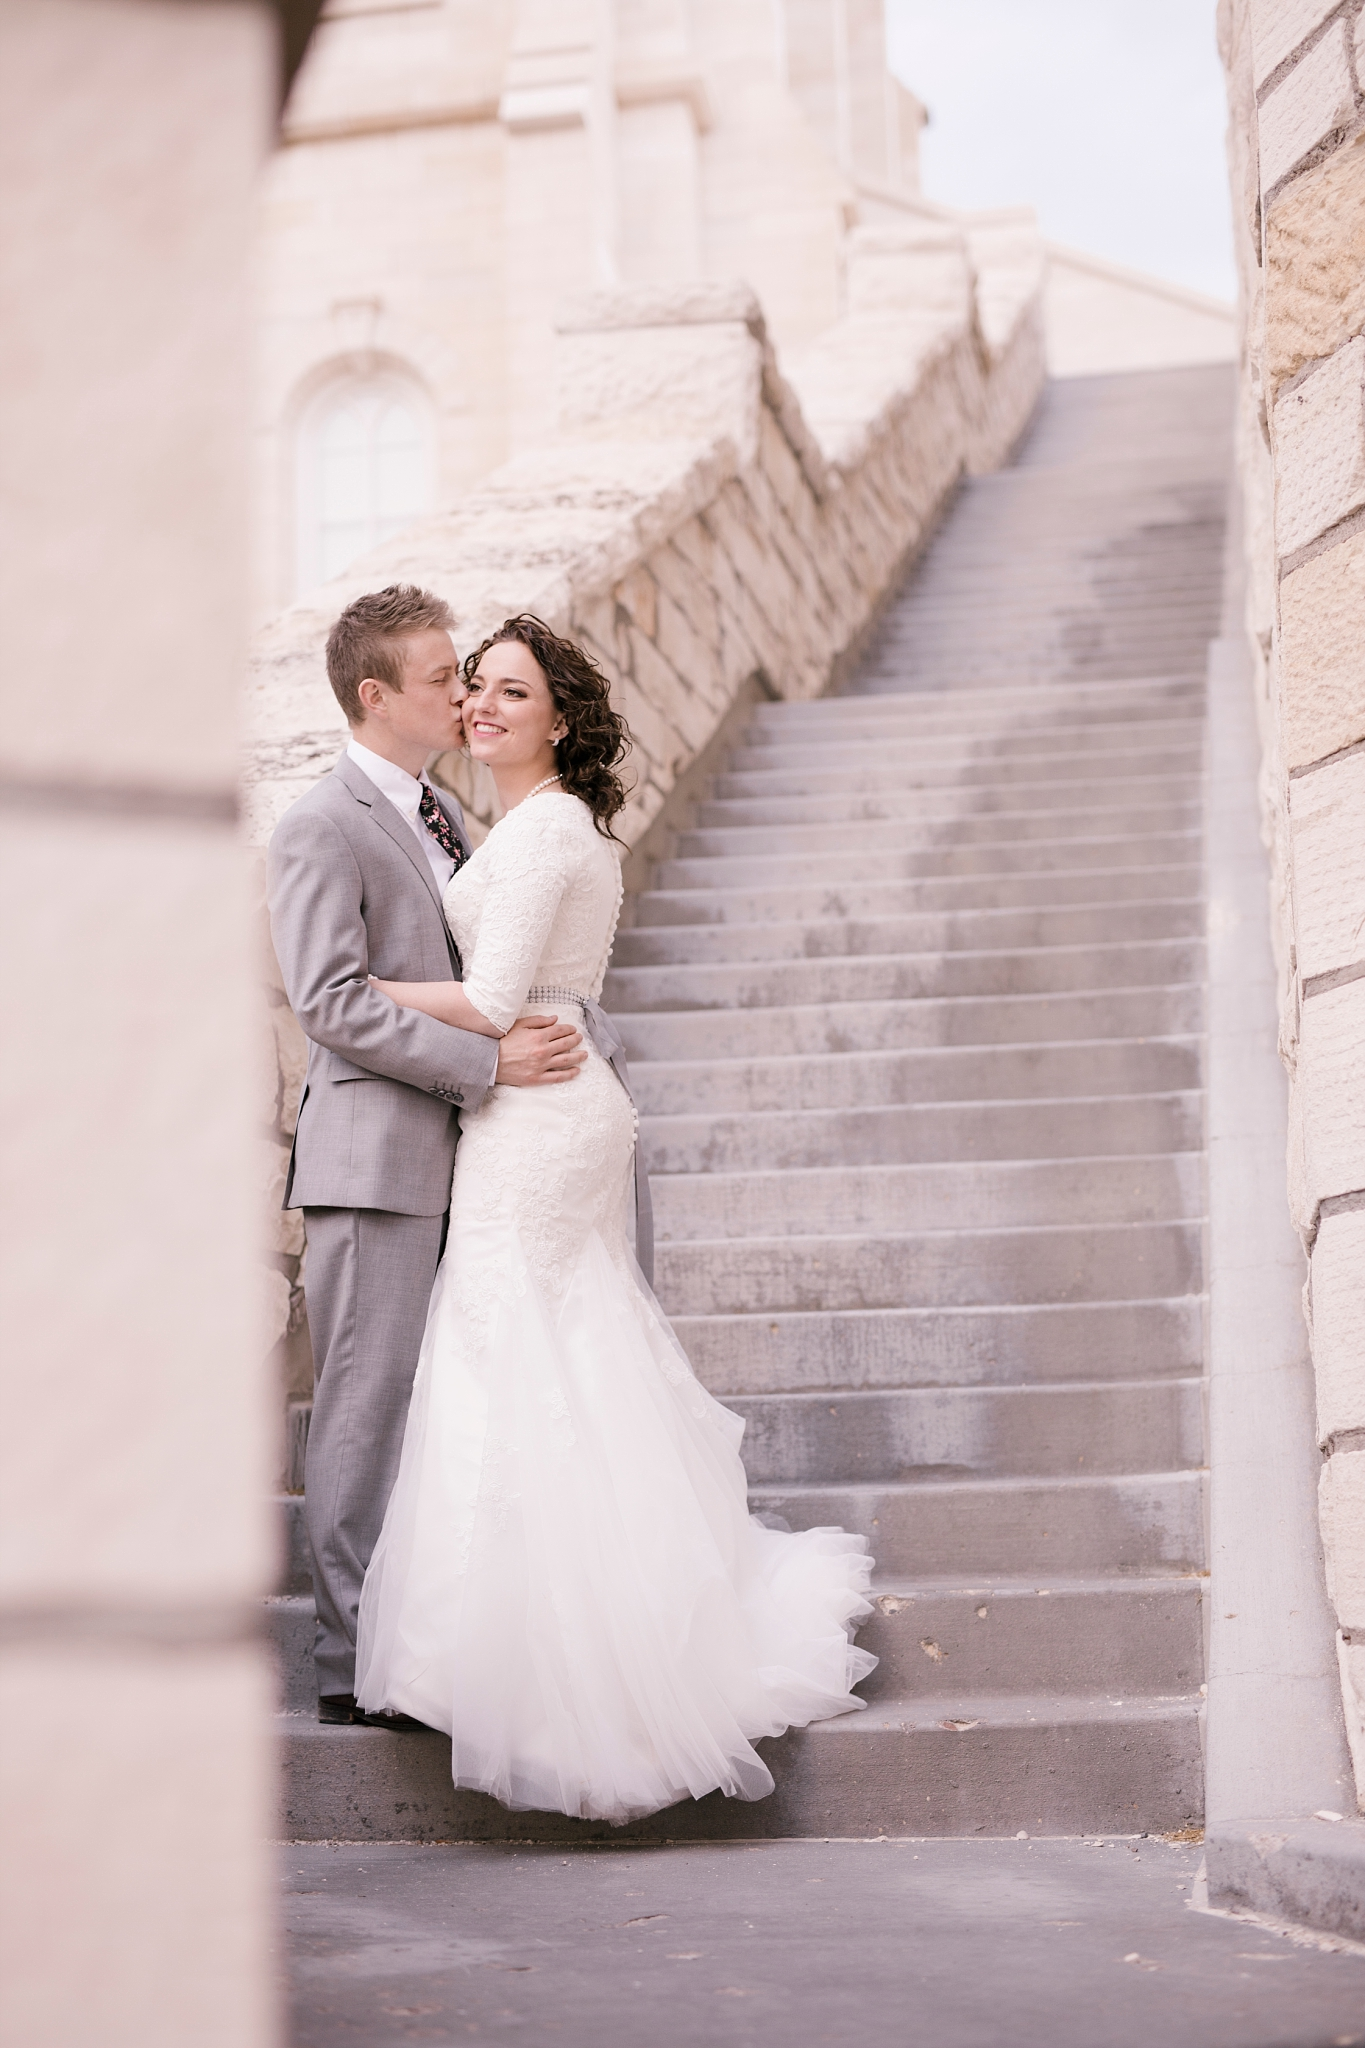 BA-Bridals-144_Lizzie-B-Imagery-Utah-Wedding-Photographer-Engagement-Photography-Salt-Lake-City-Park-City-Utah-County-Manti-Utah-Temple.jpg